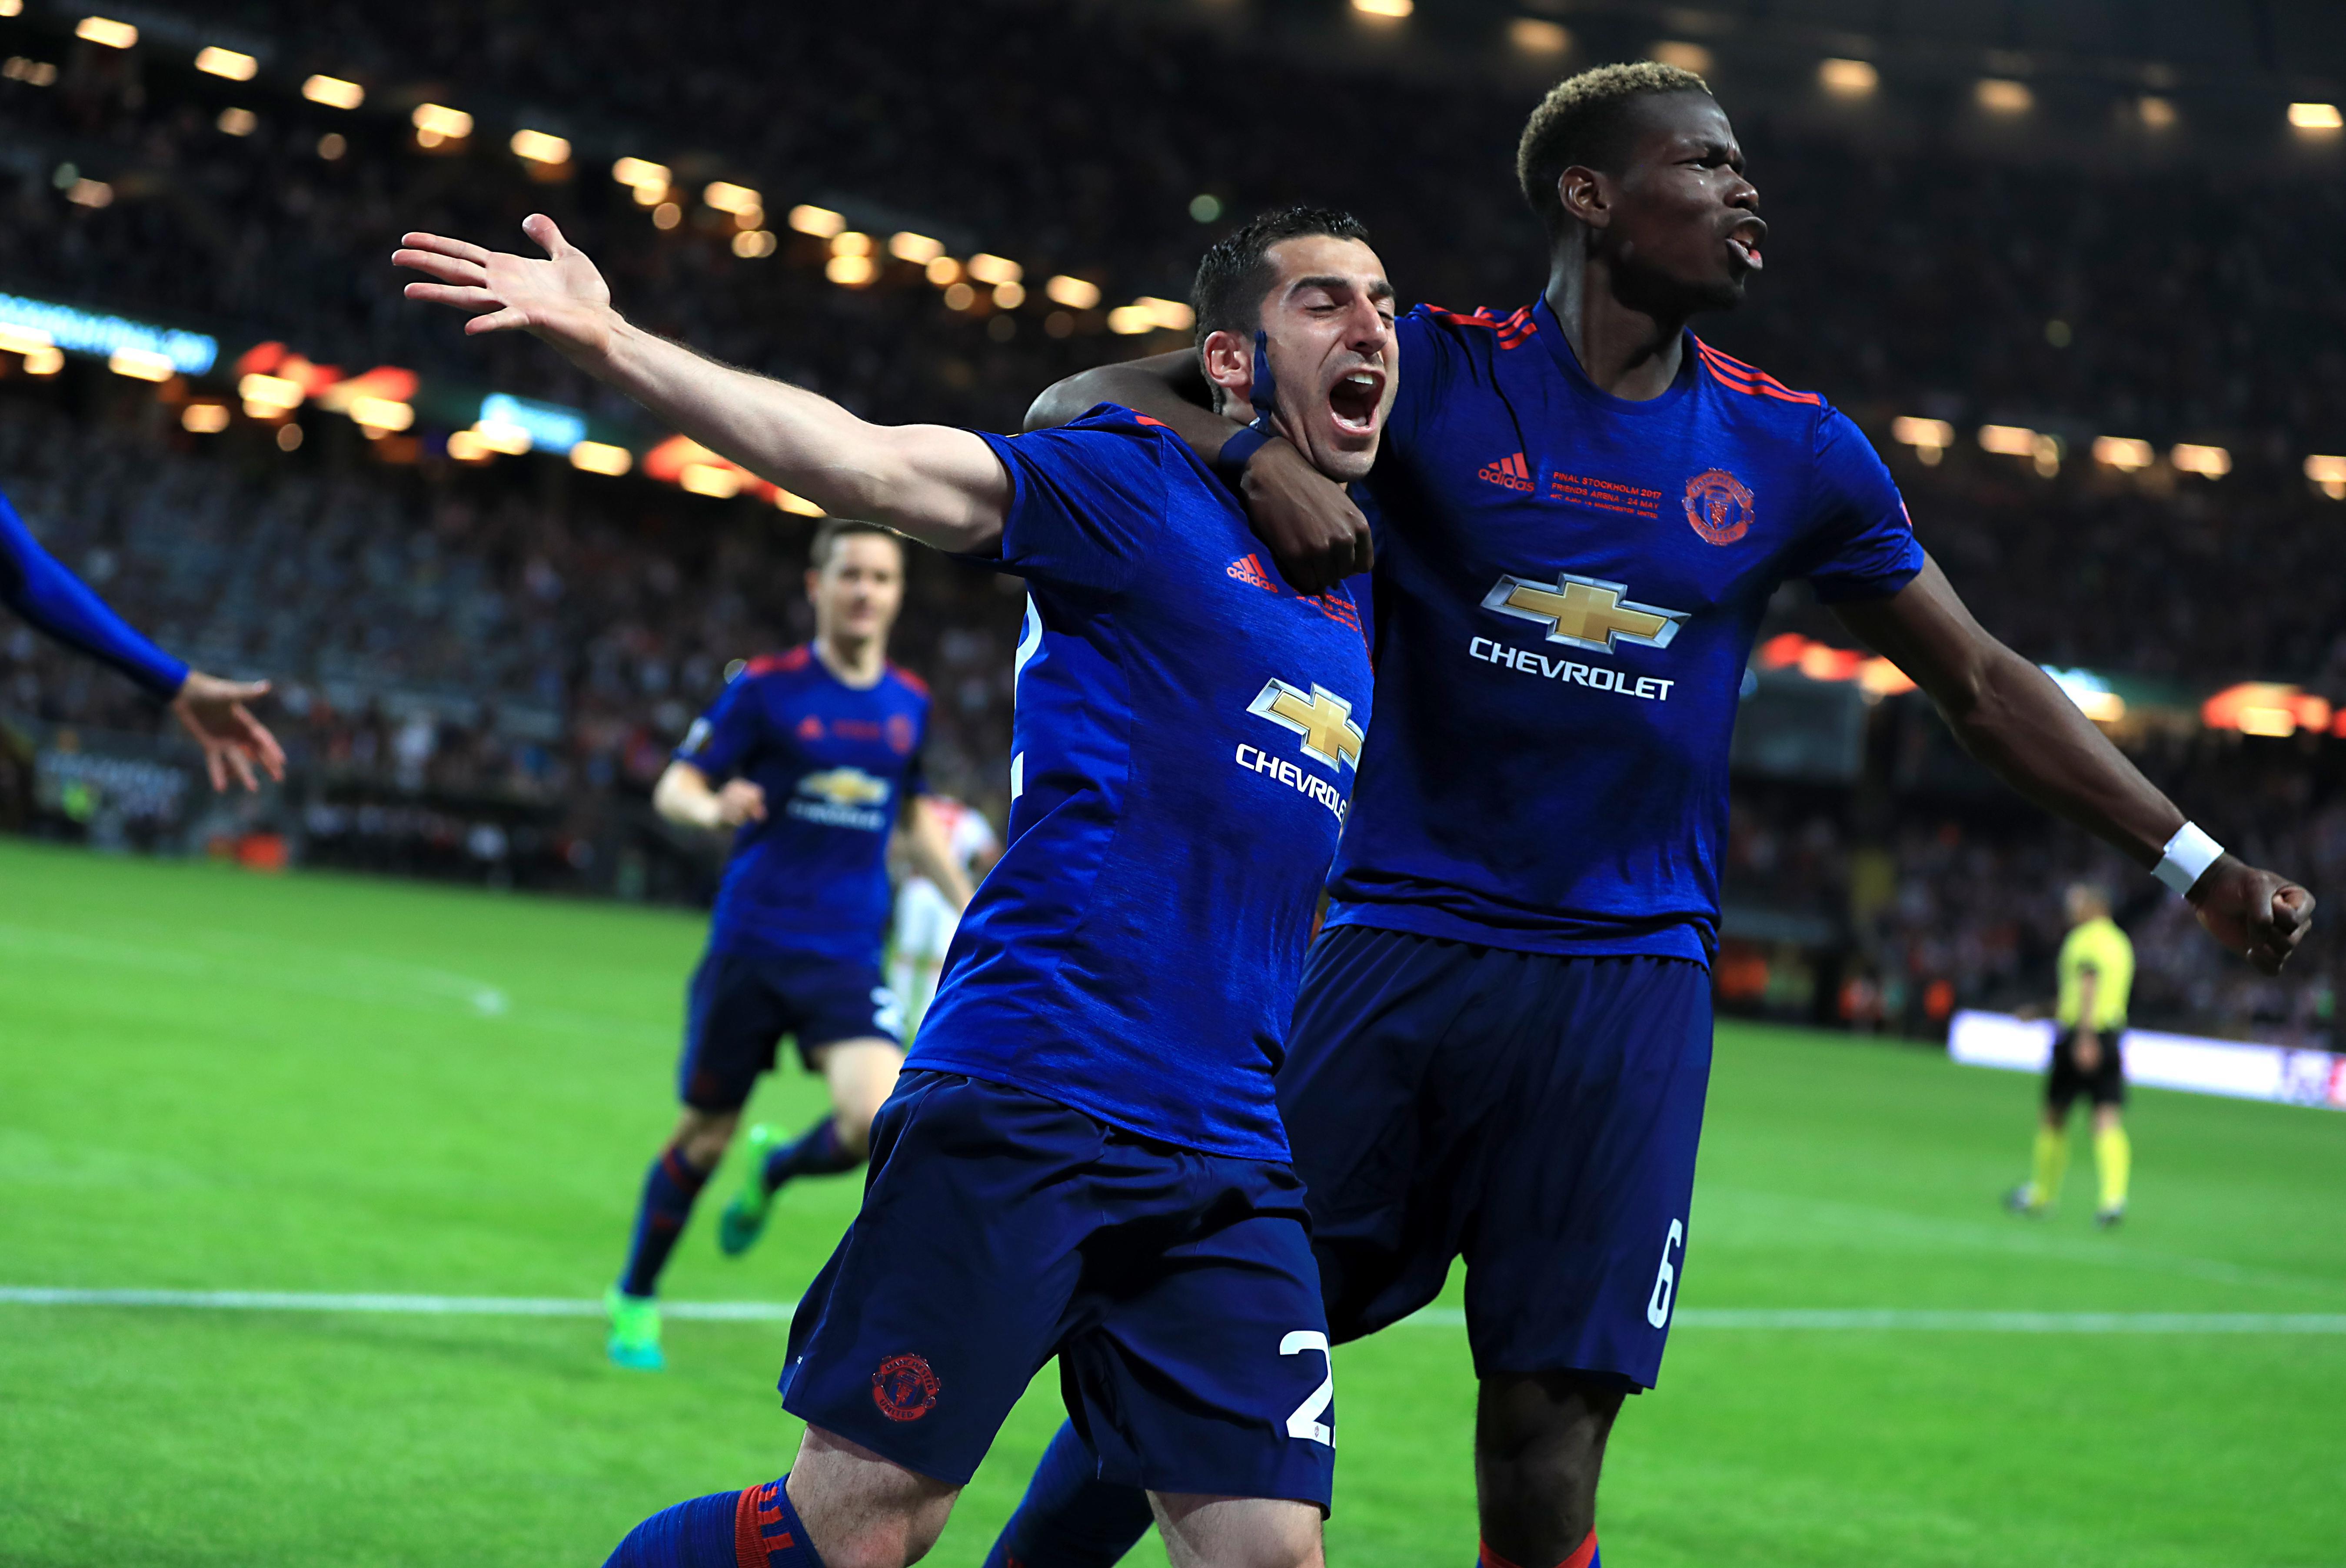 Mkhi was a big part of United's Europa League success last season